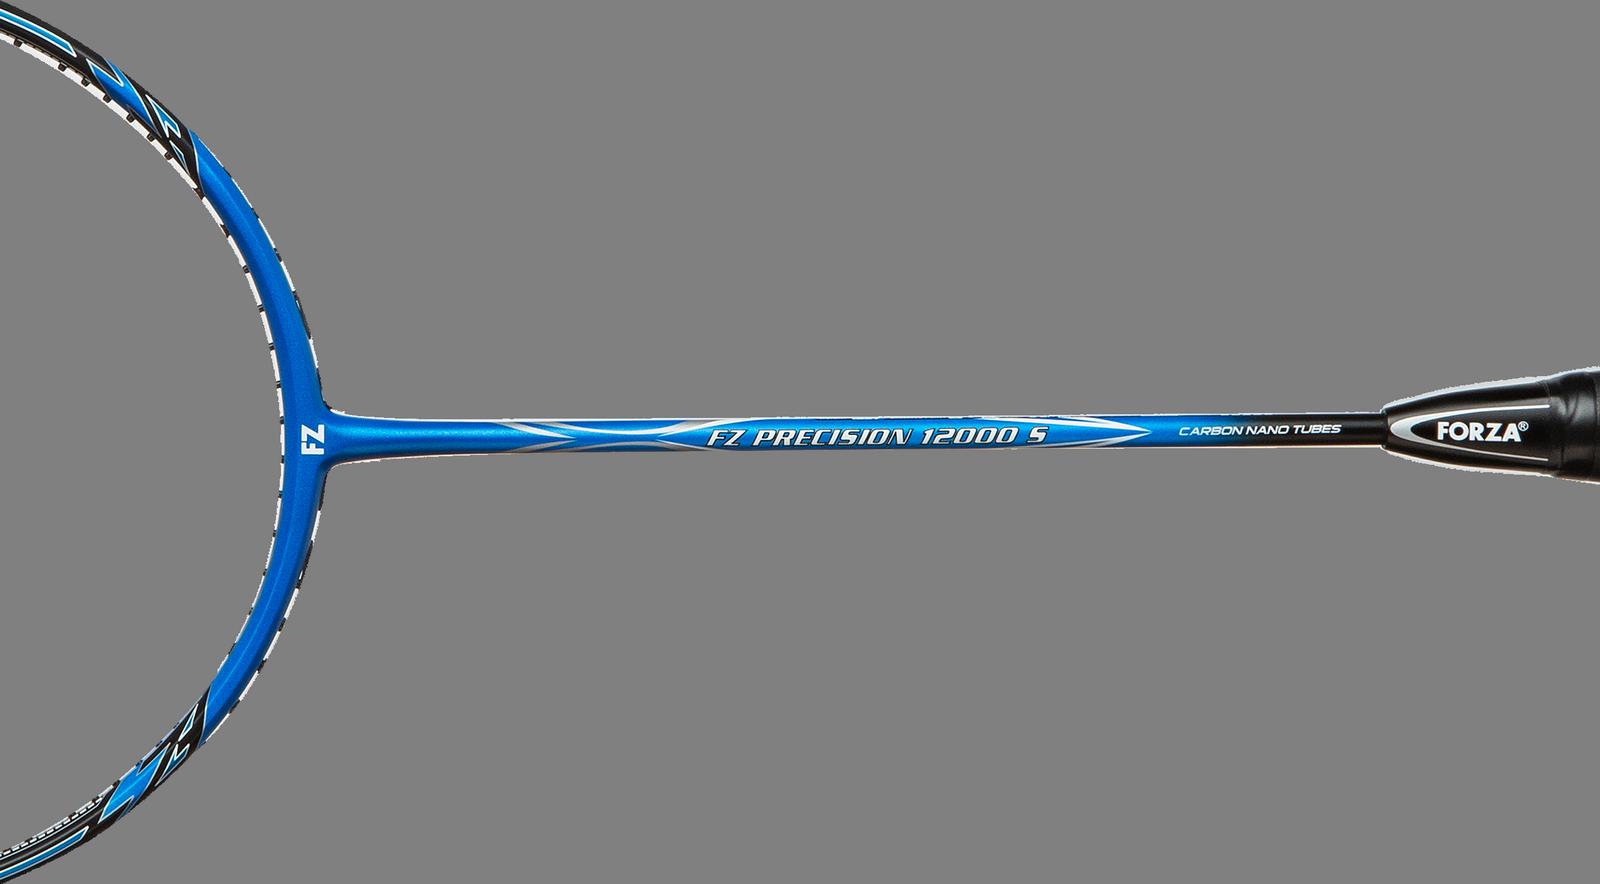 Forza Precision 12000 S (besaitet)